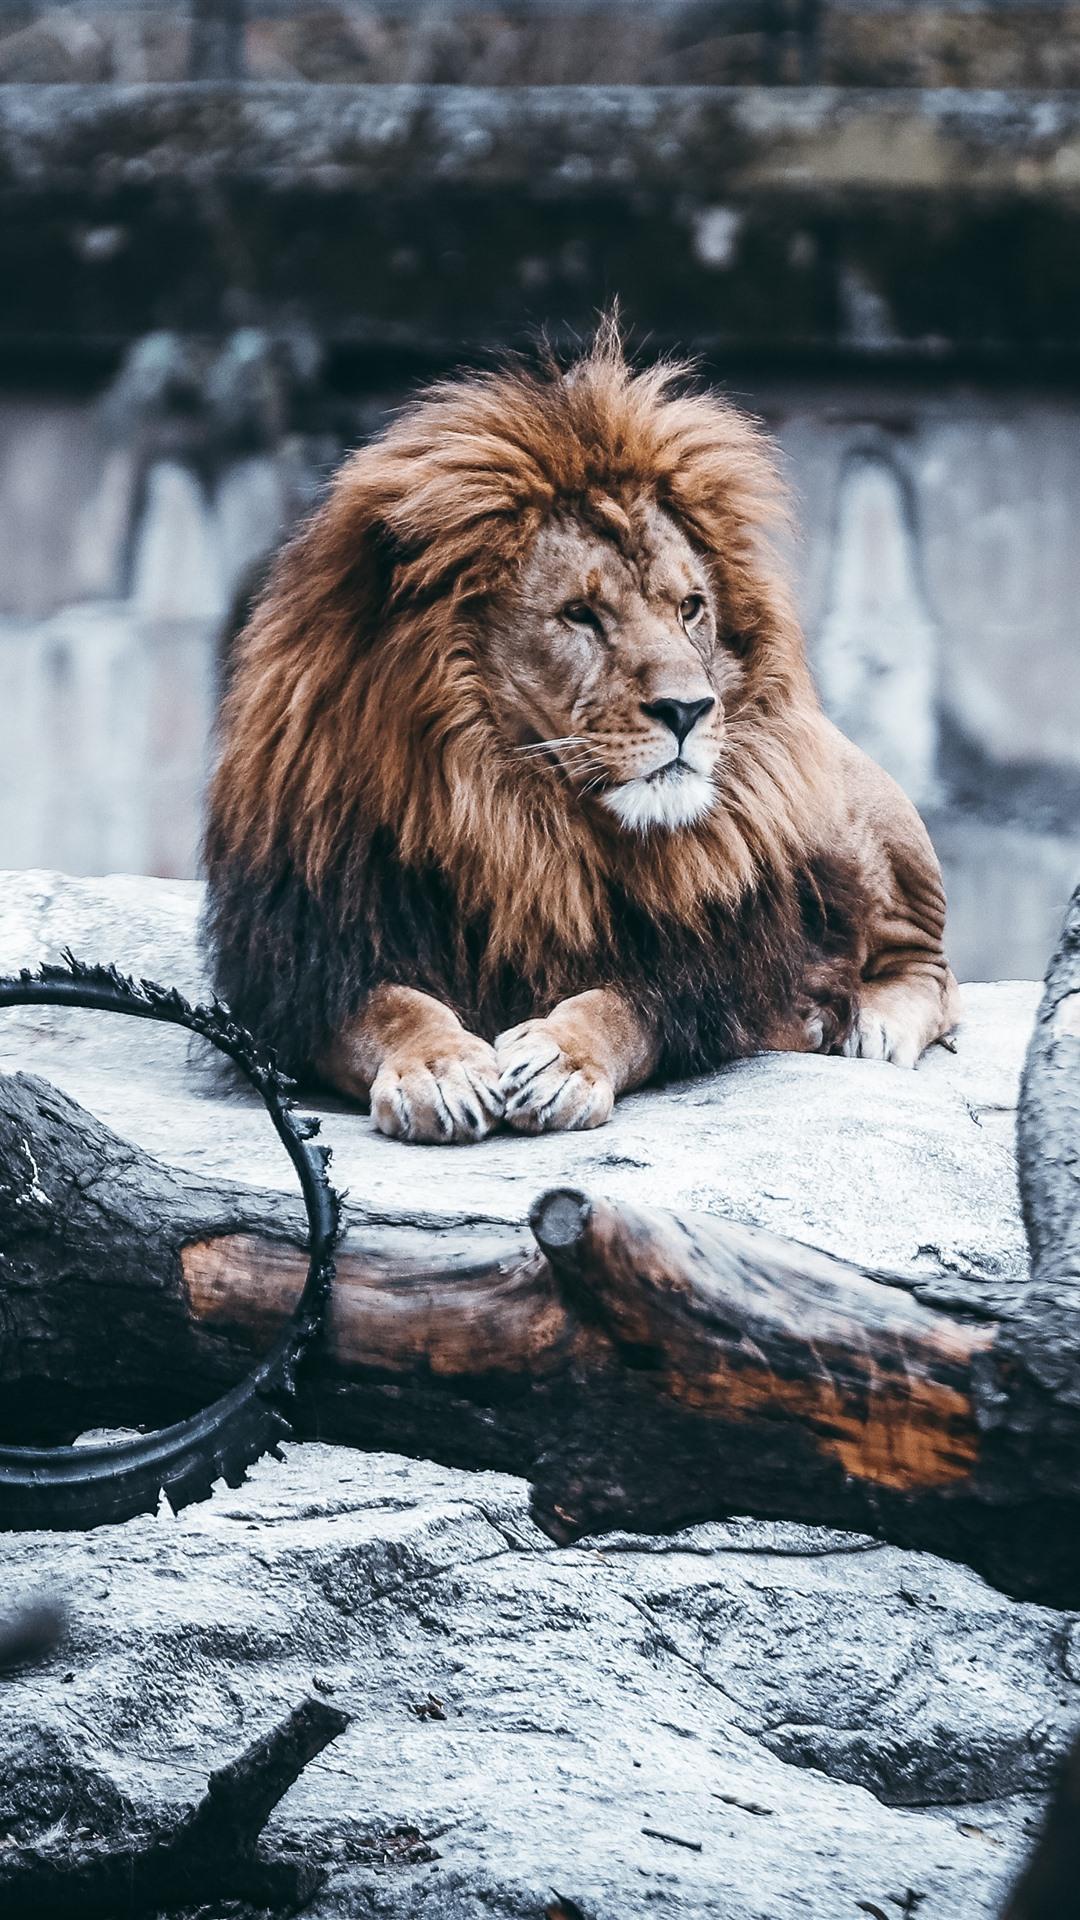 Lion Wallpaper Iphone 8 Plus 1080x1920 Wallpaper Teahub Io